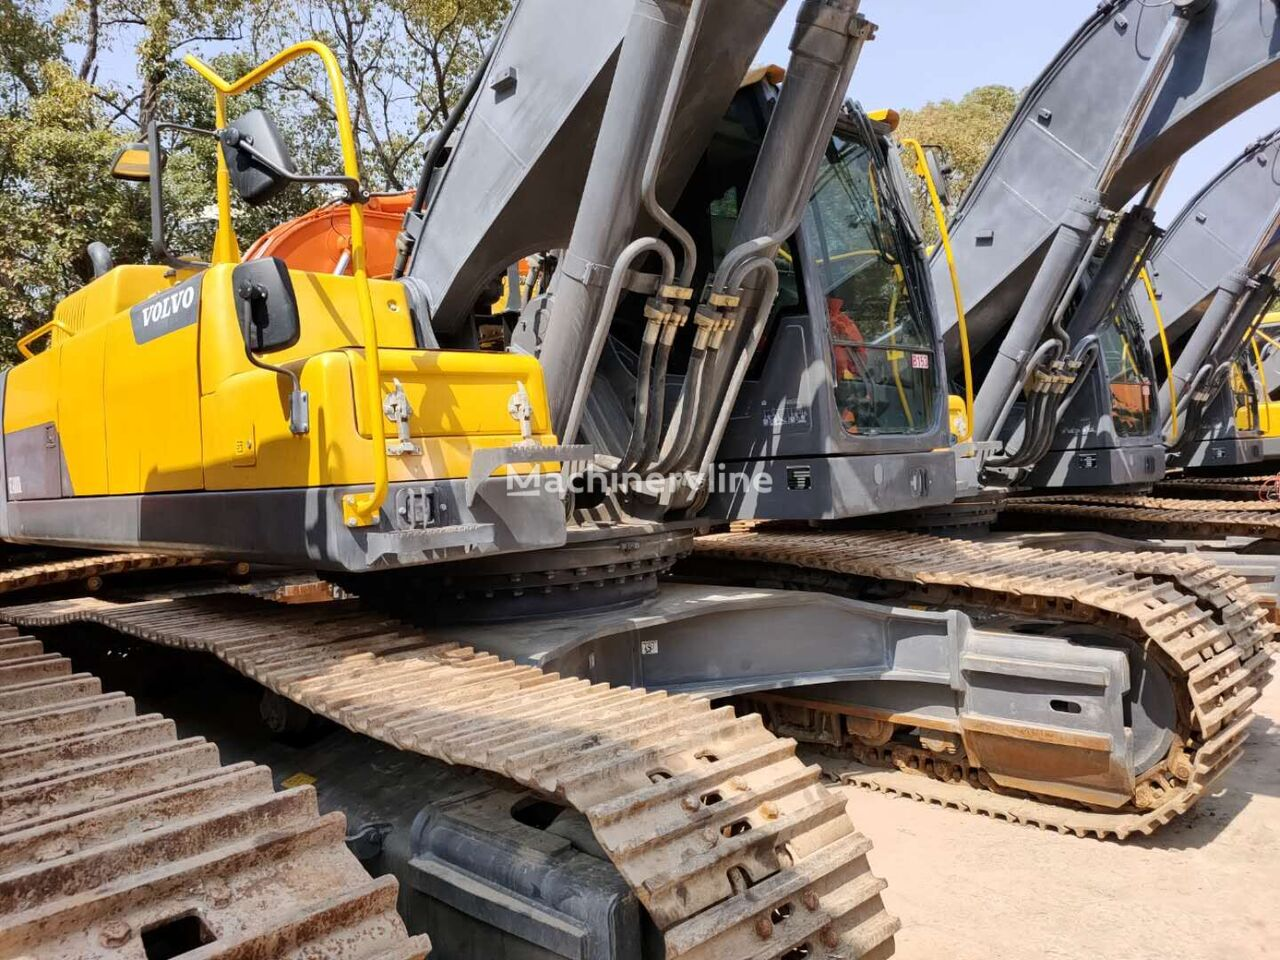 VOLVO EC480DL tracked excavator